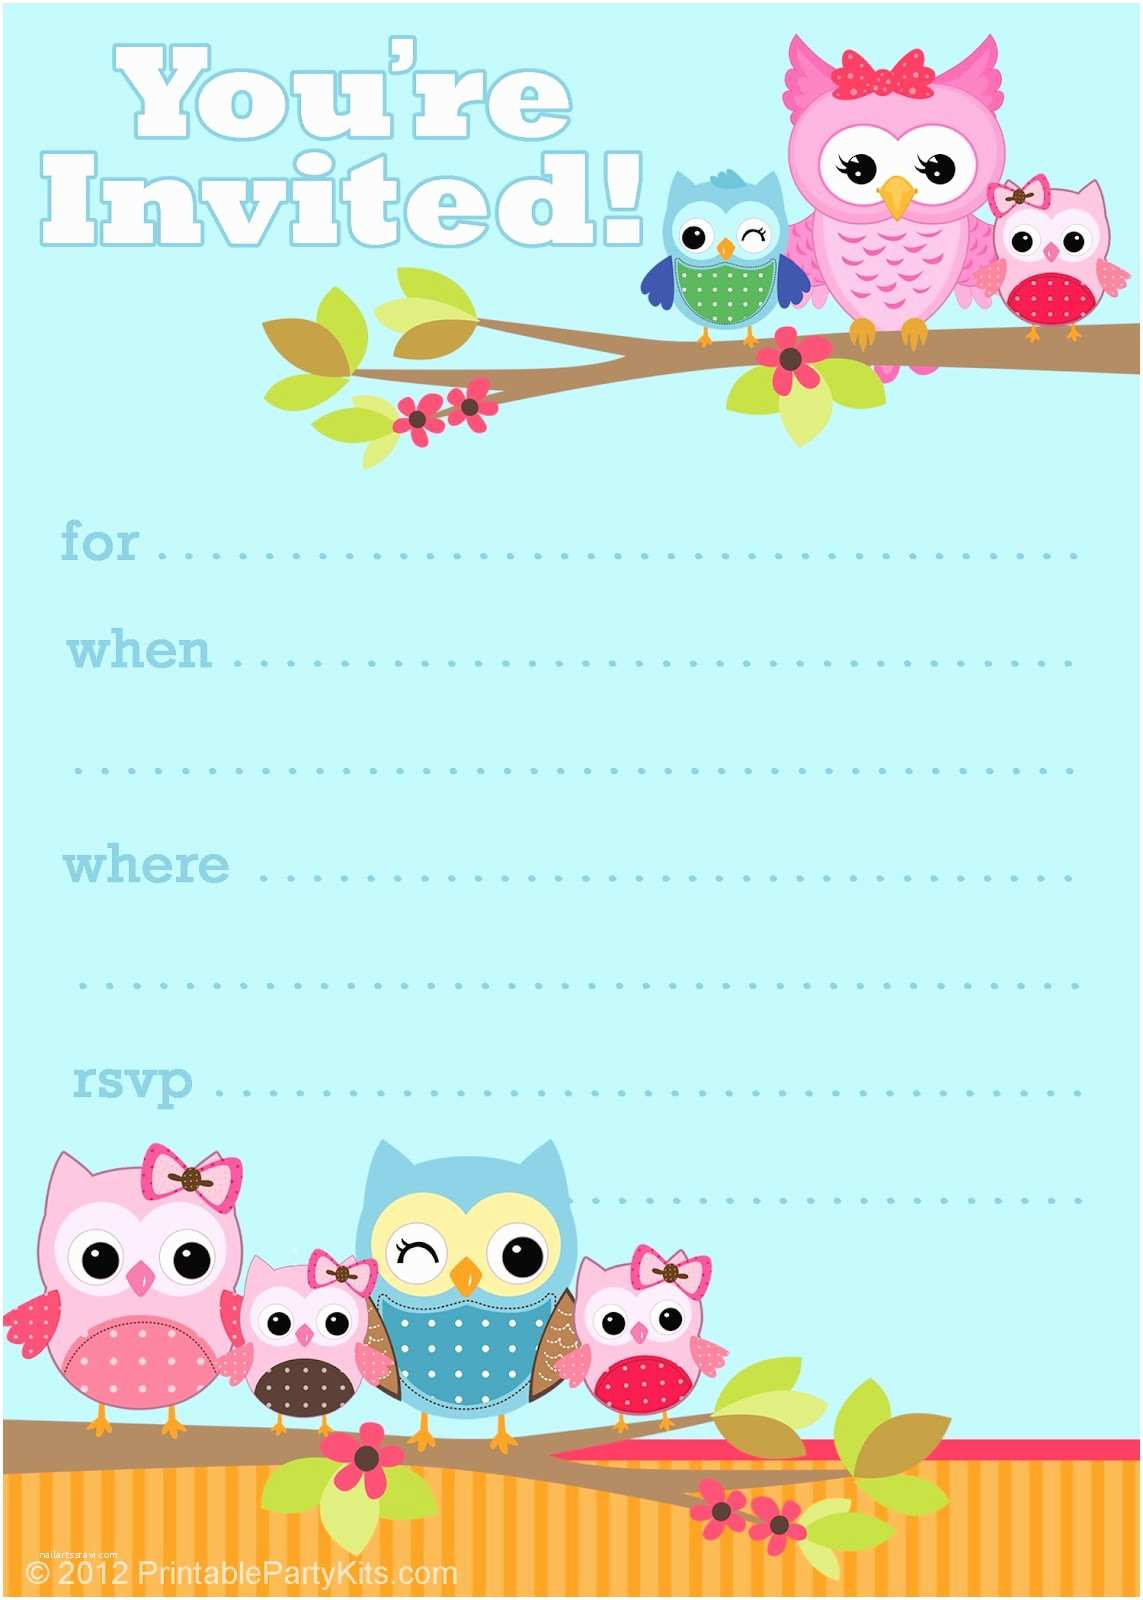 Free Printable Owl Baby Shower Invitations Free Printable Party Invitations Cute Owl Invitations